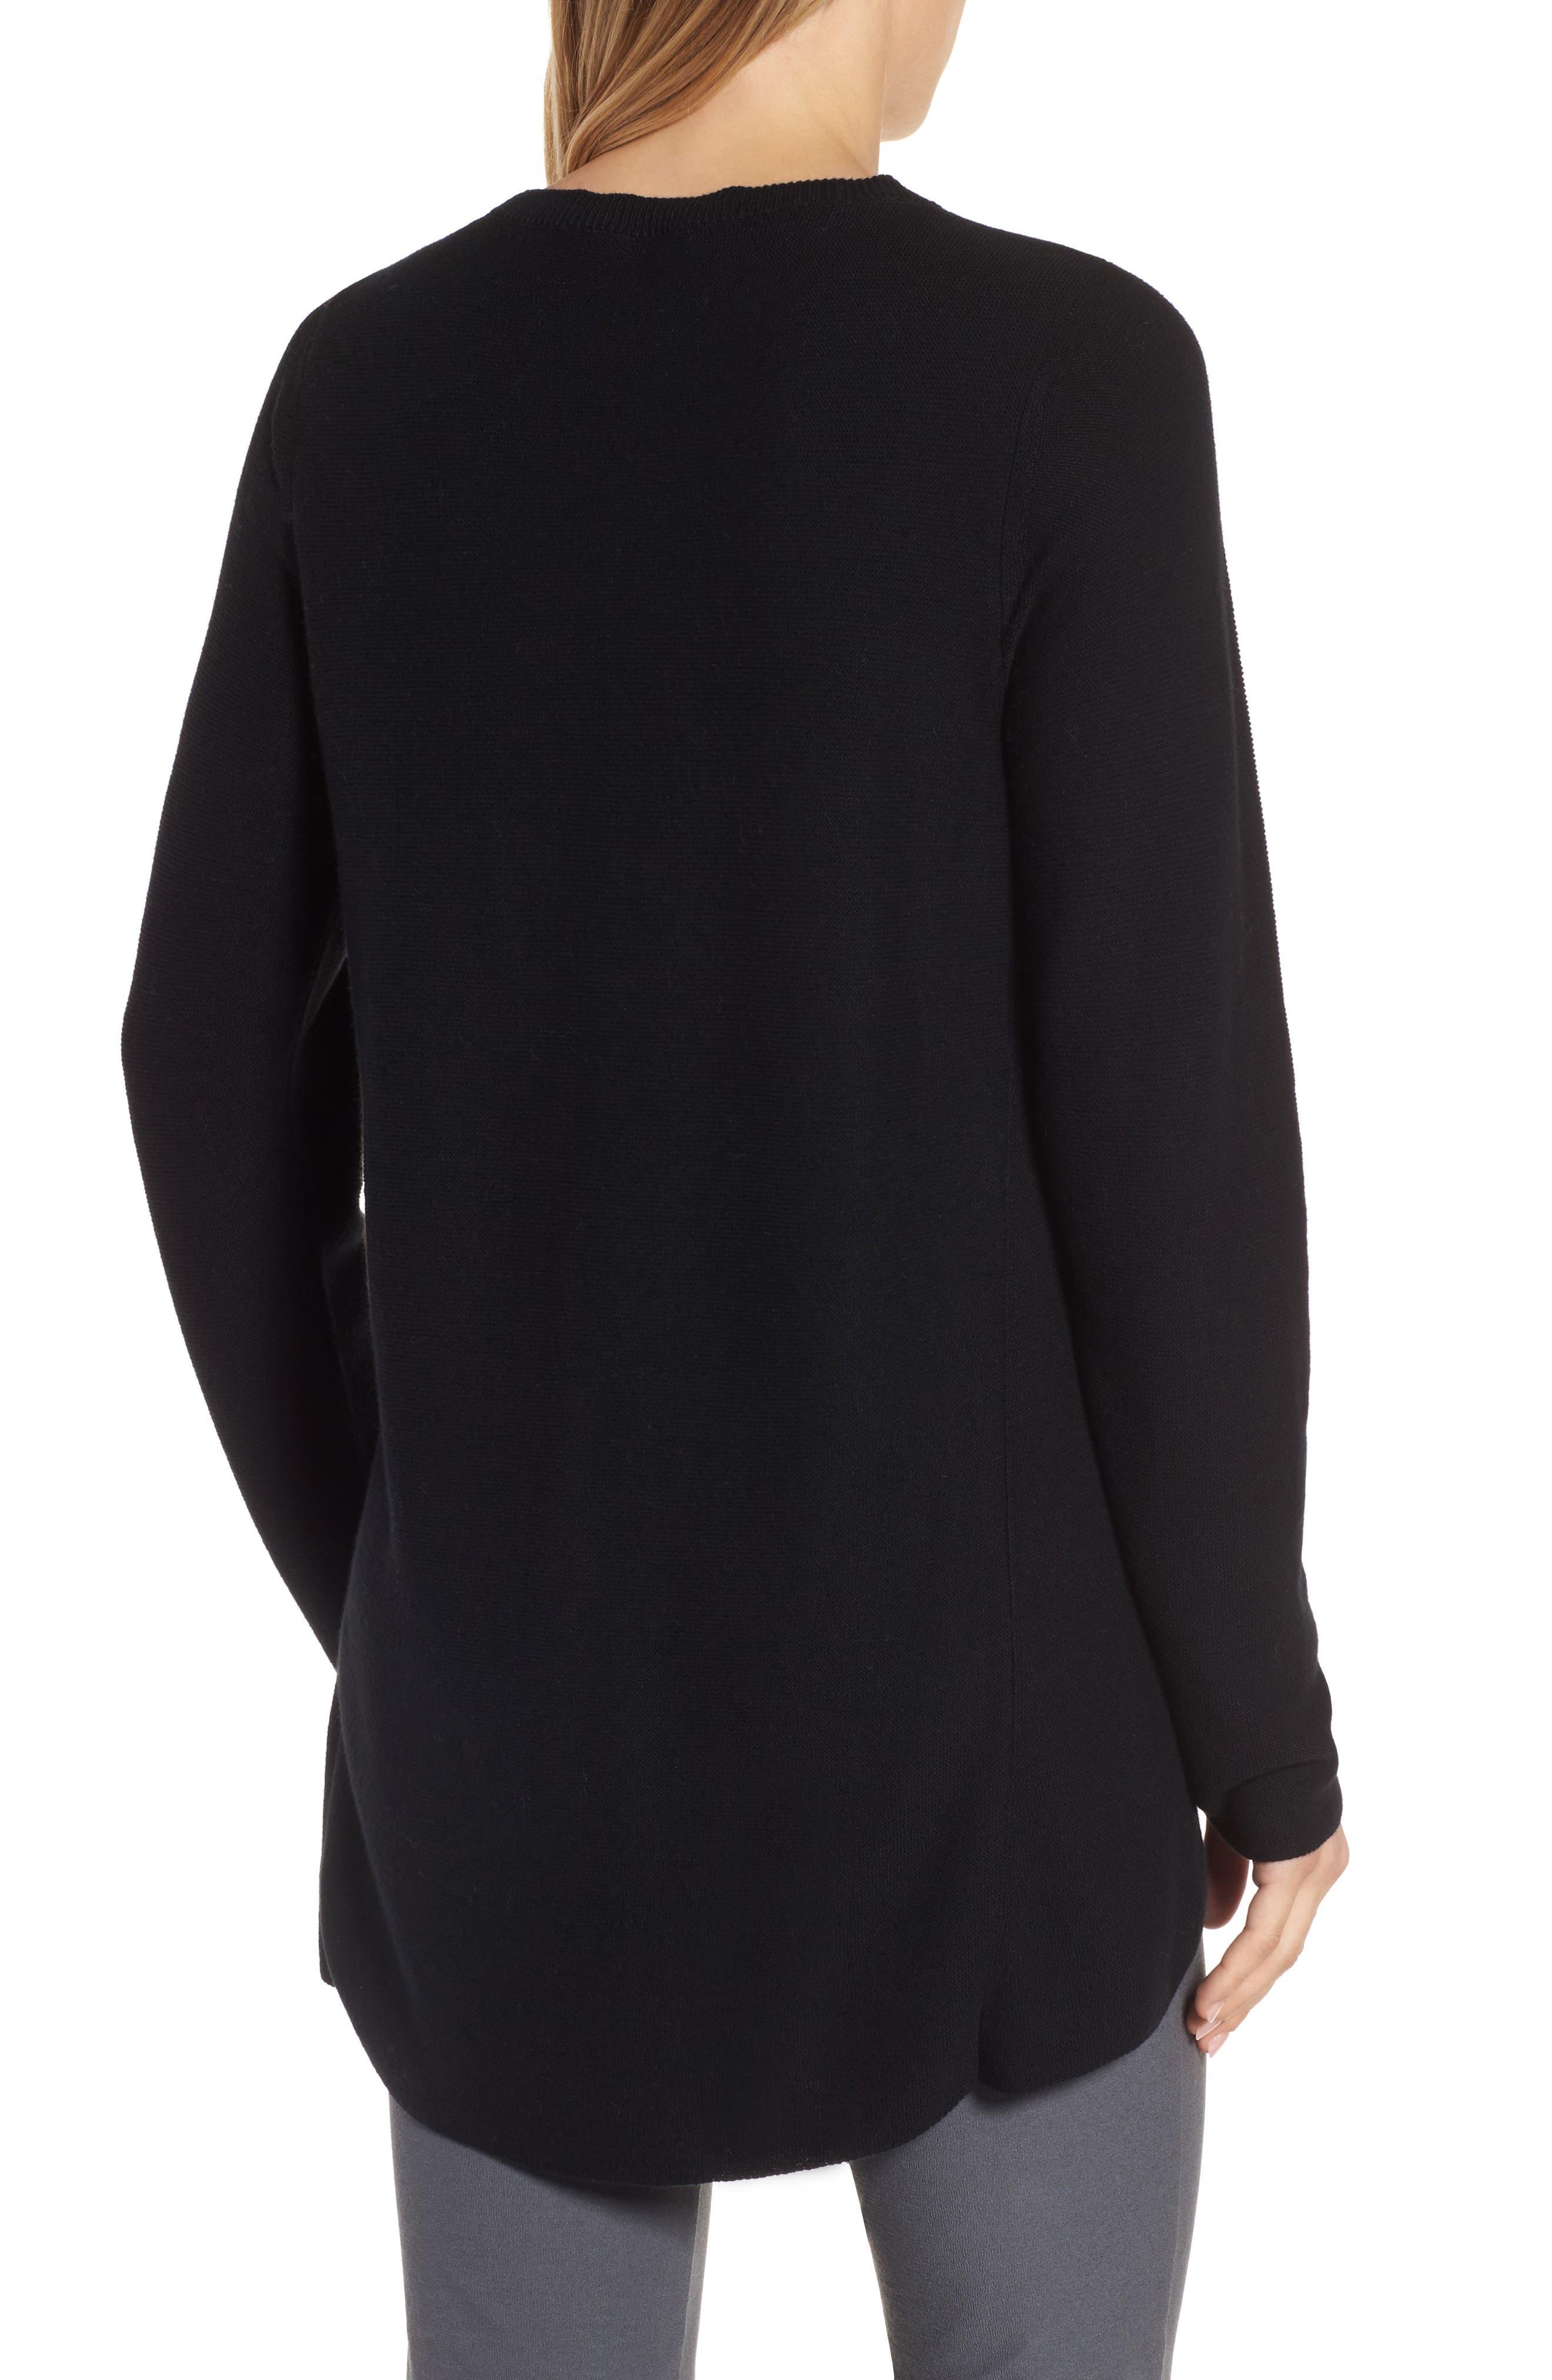 Organic Cotton Tunic Sweater,                             Alternate thumbnail 2, color,                             Black